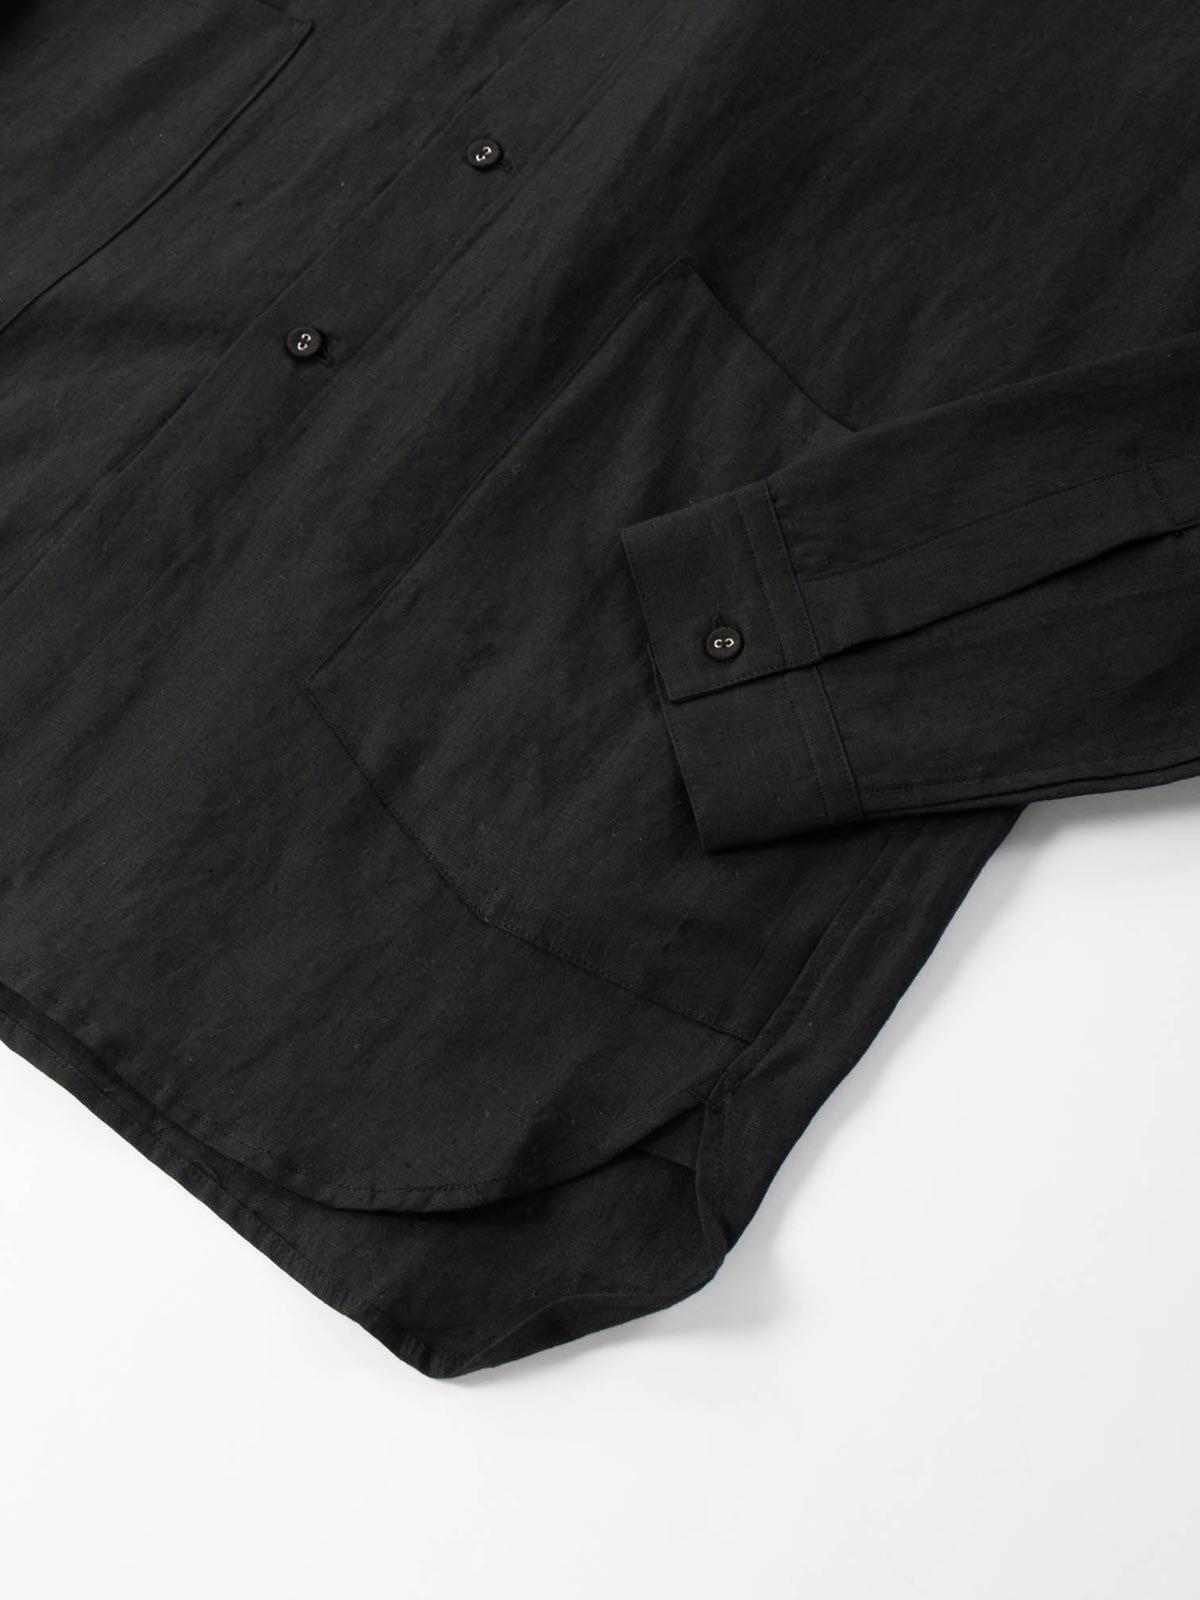 LINEN GARDNER SHIRT BLACK - Image 5